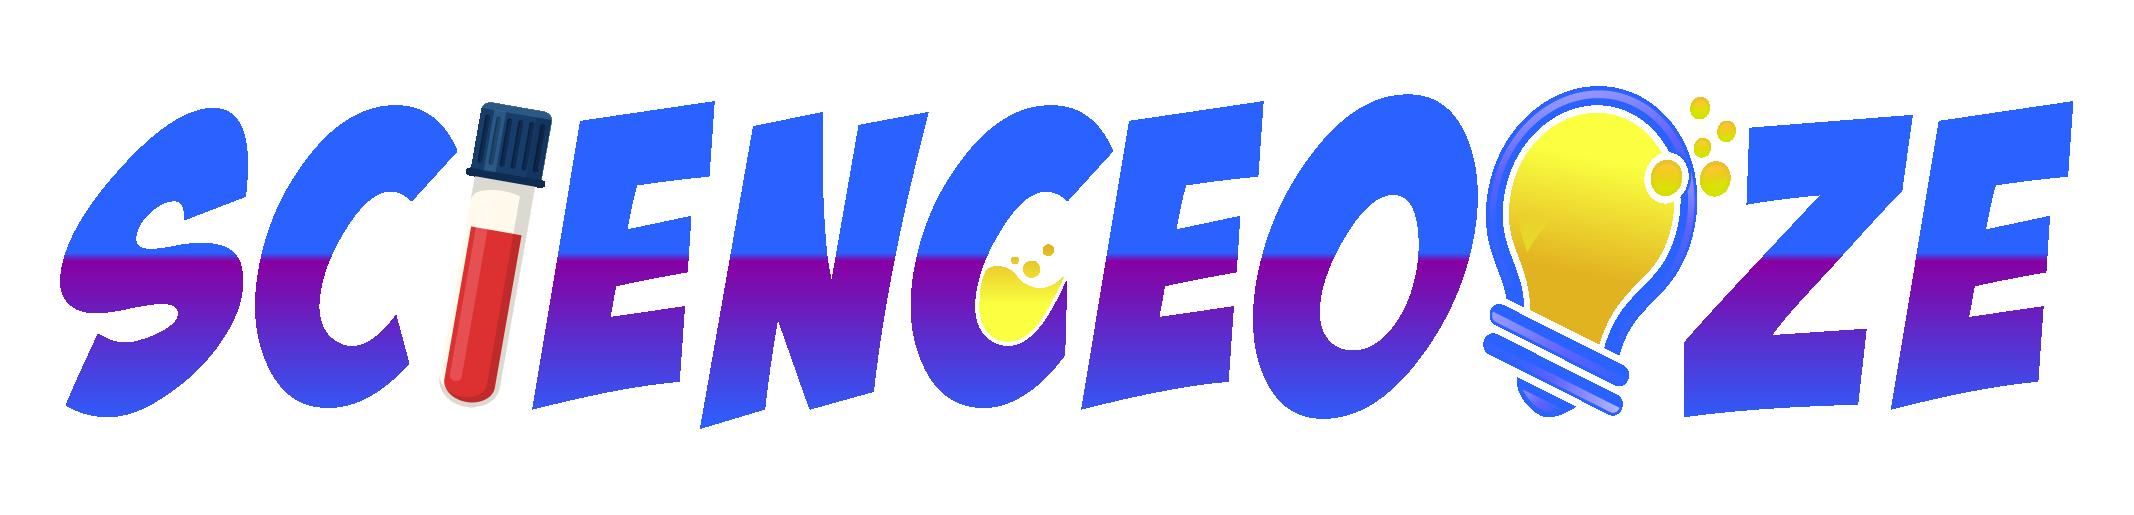 Scienceooze